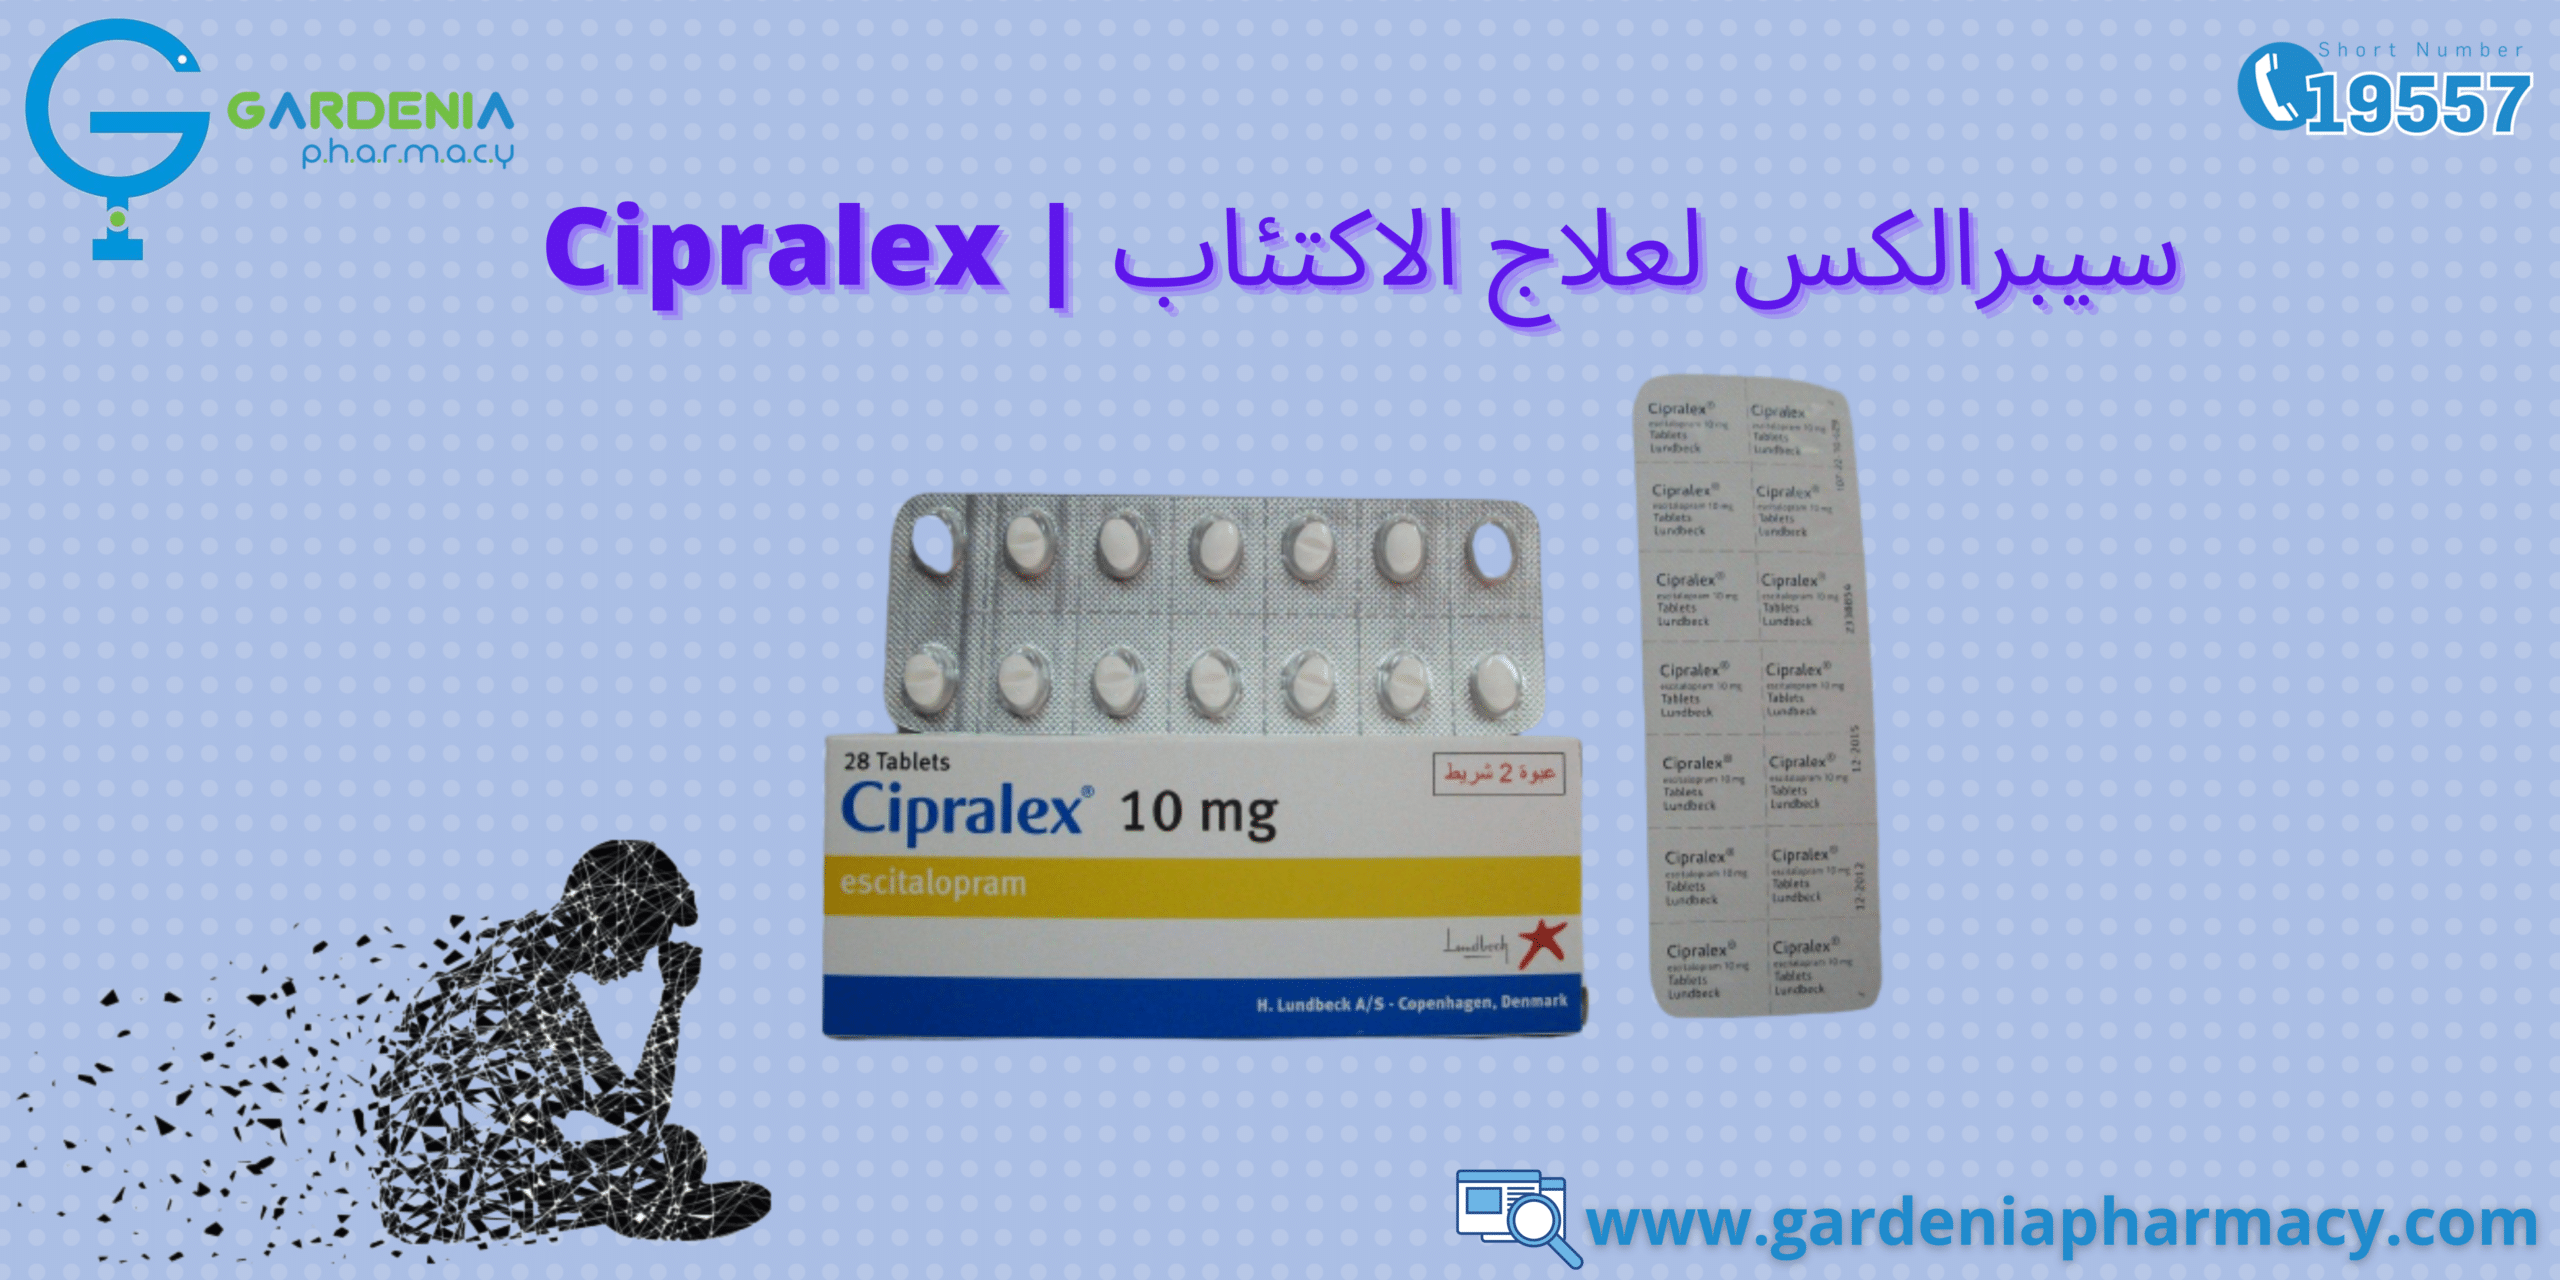 Cipralex